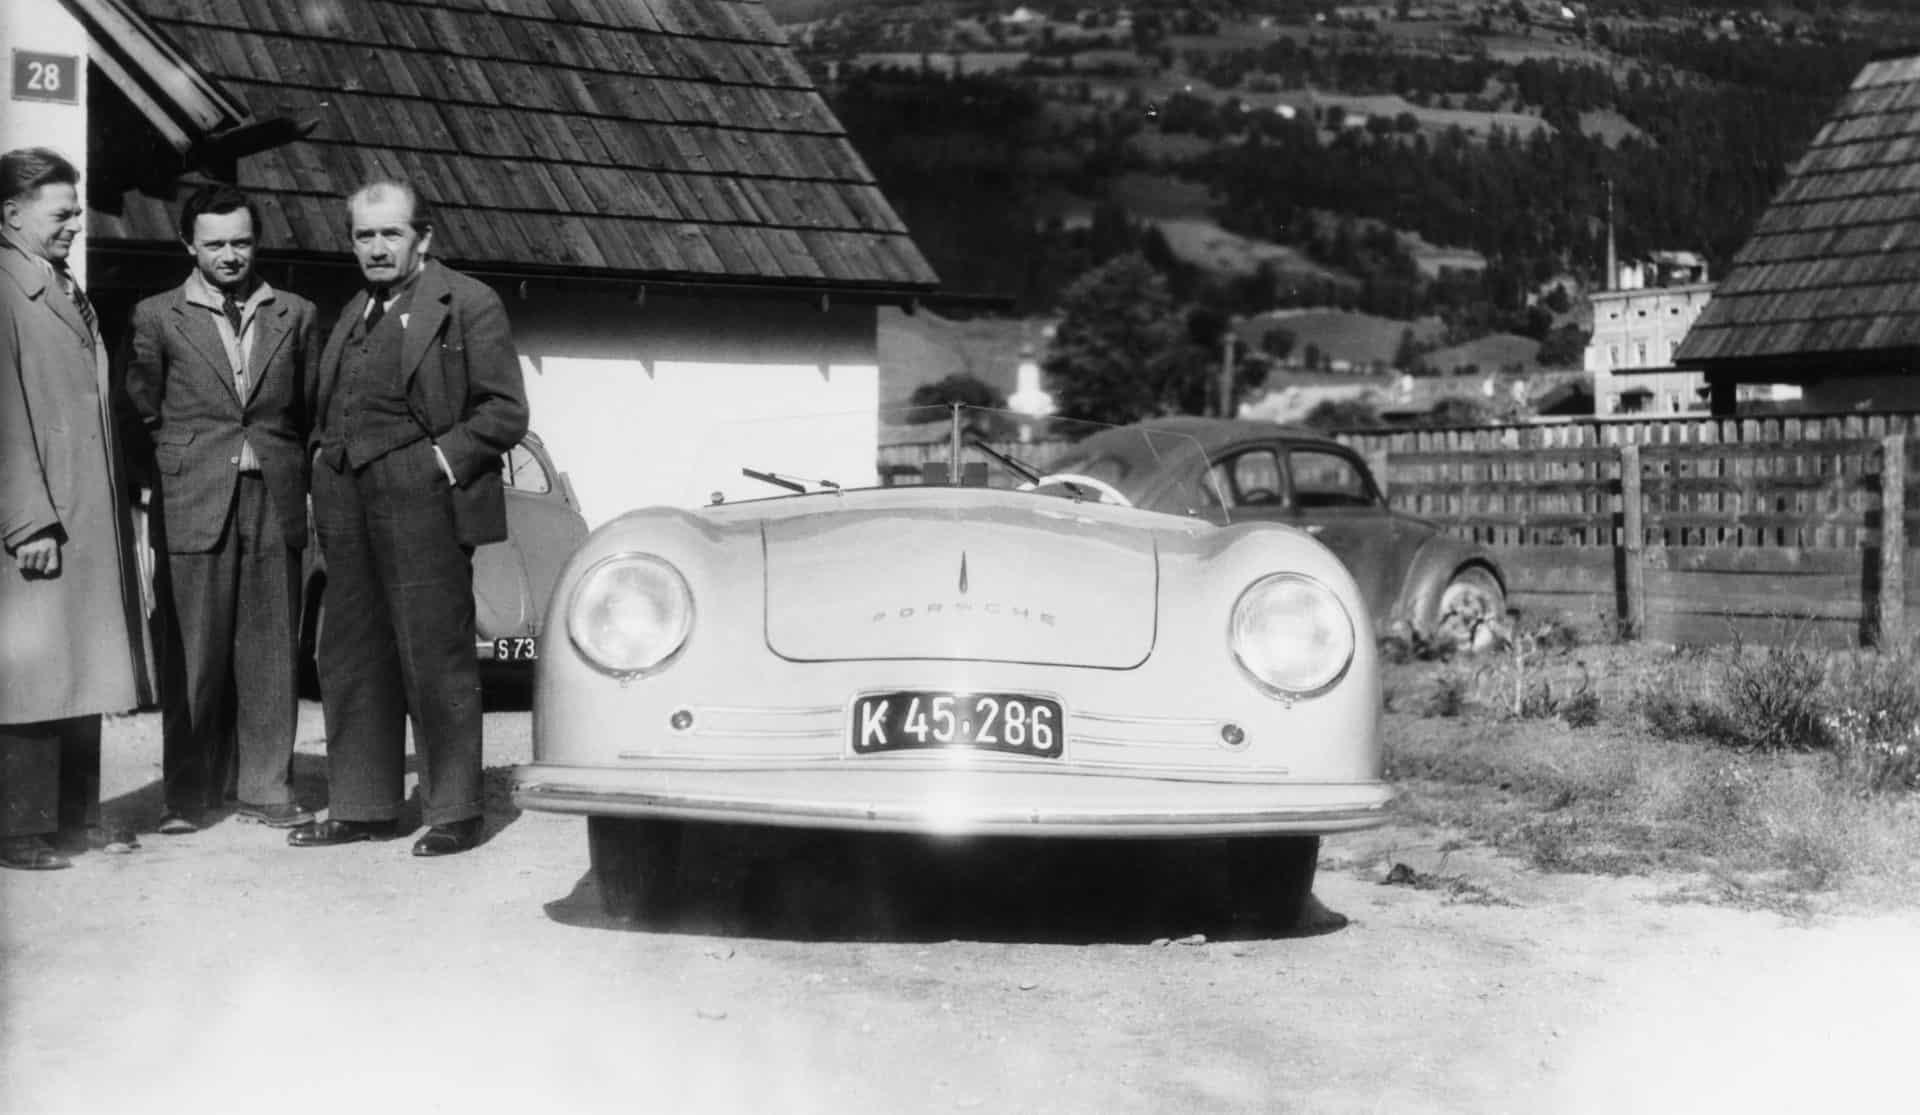 Ferry Porsche (rechts) mit dem Porsche 356-er